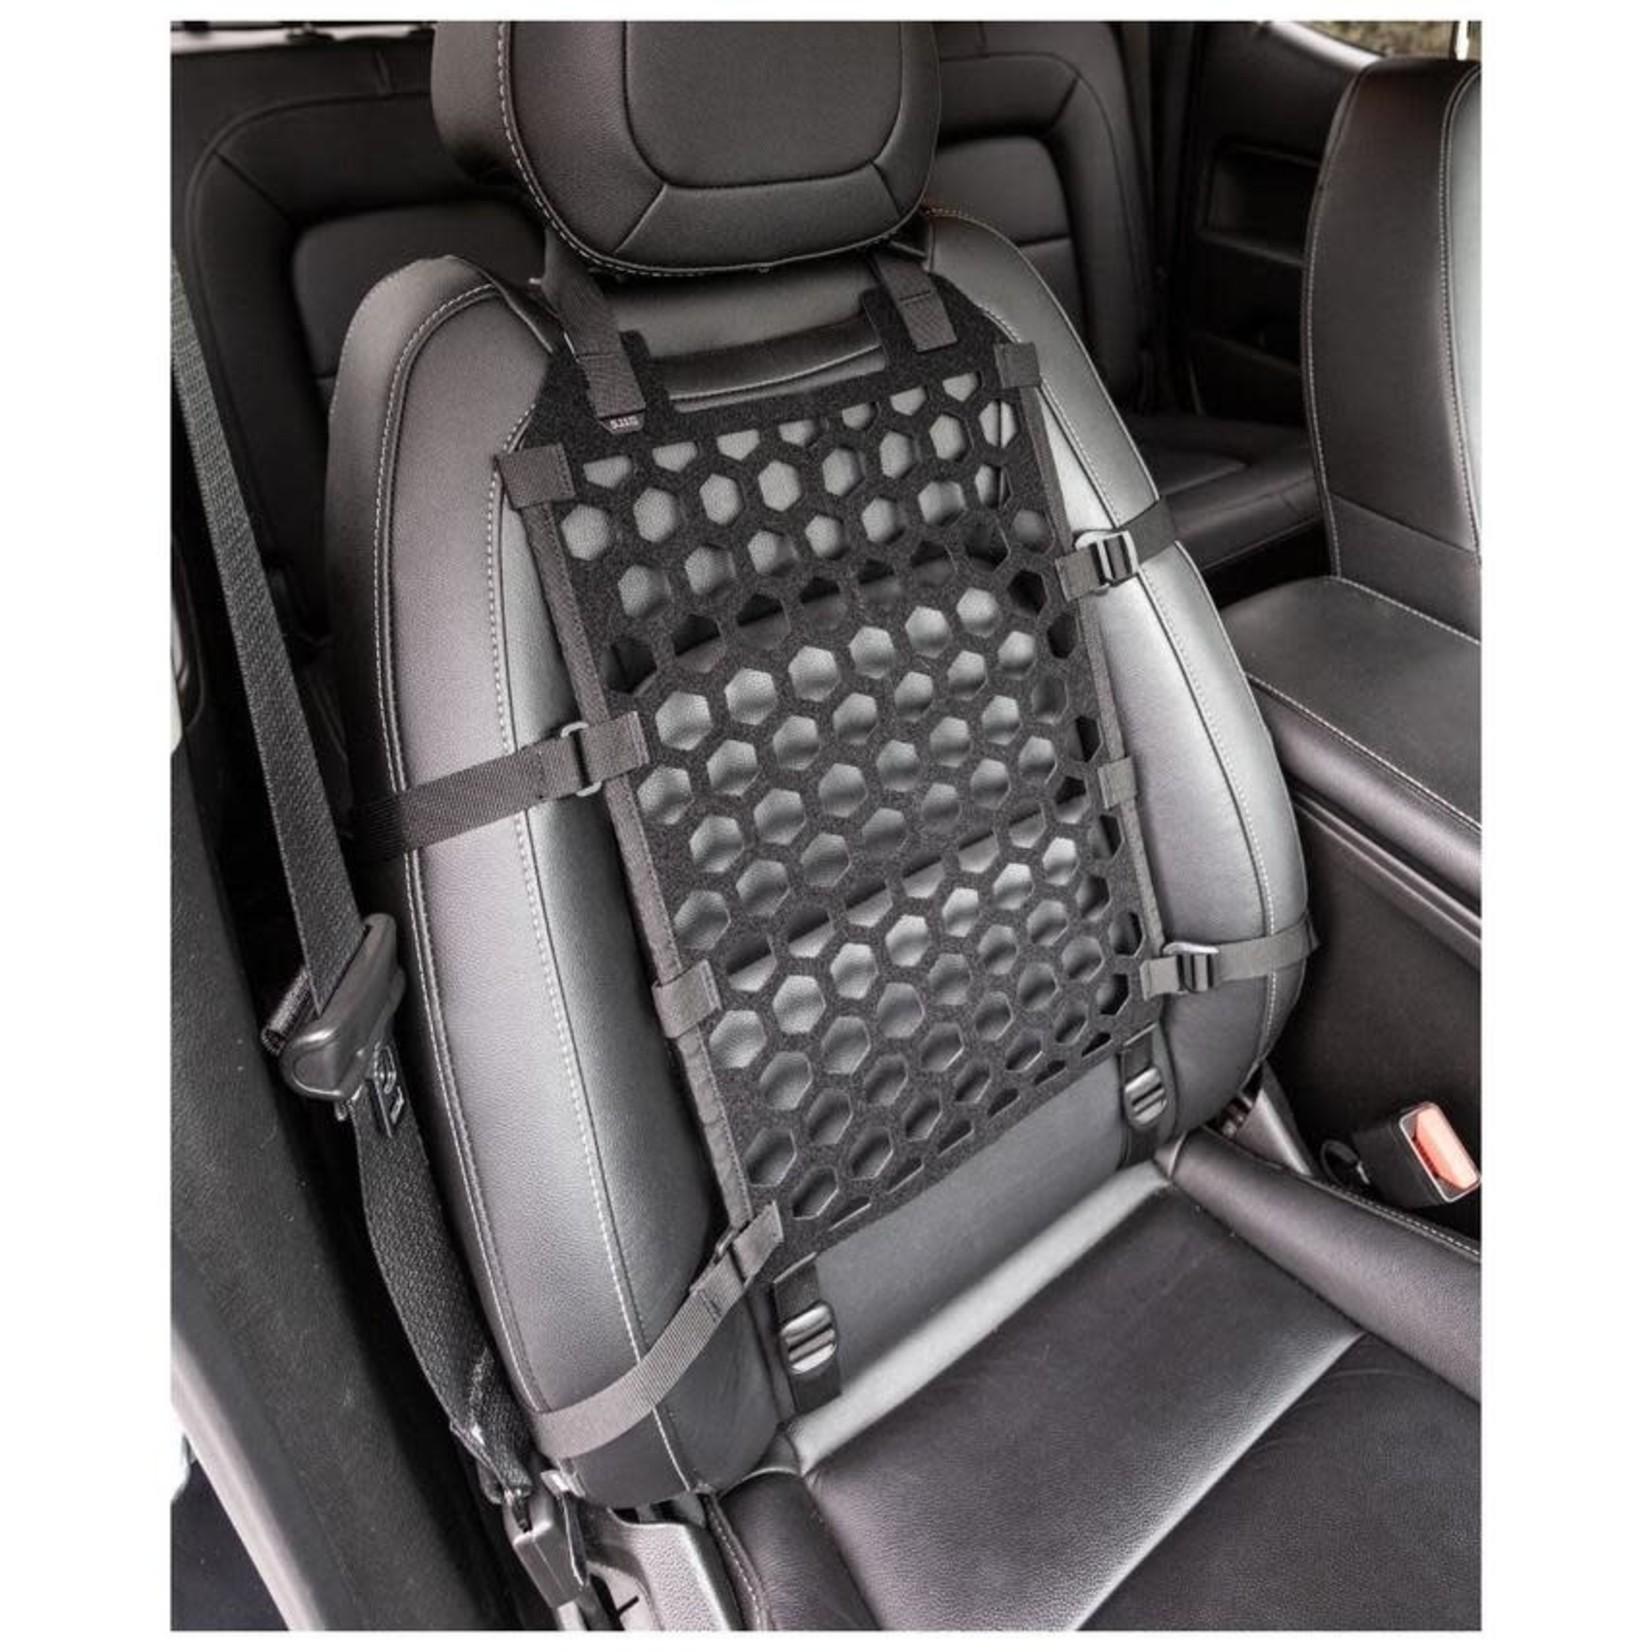 5.11 Tactical 5.11 Vehicle Ready Hexgrid Seat Platform